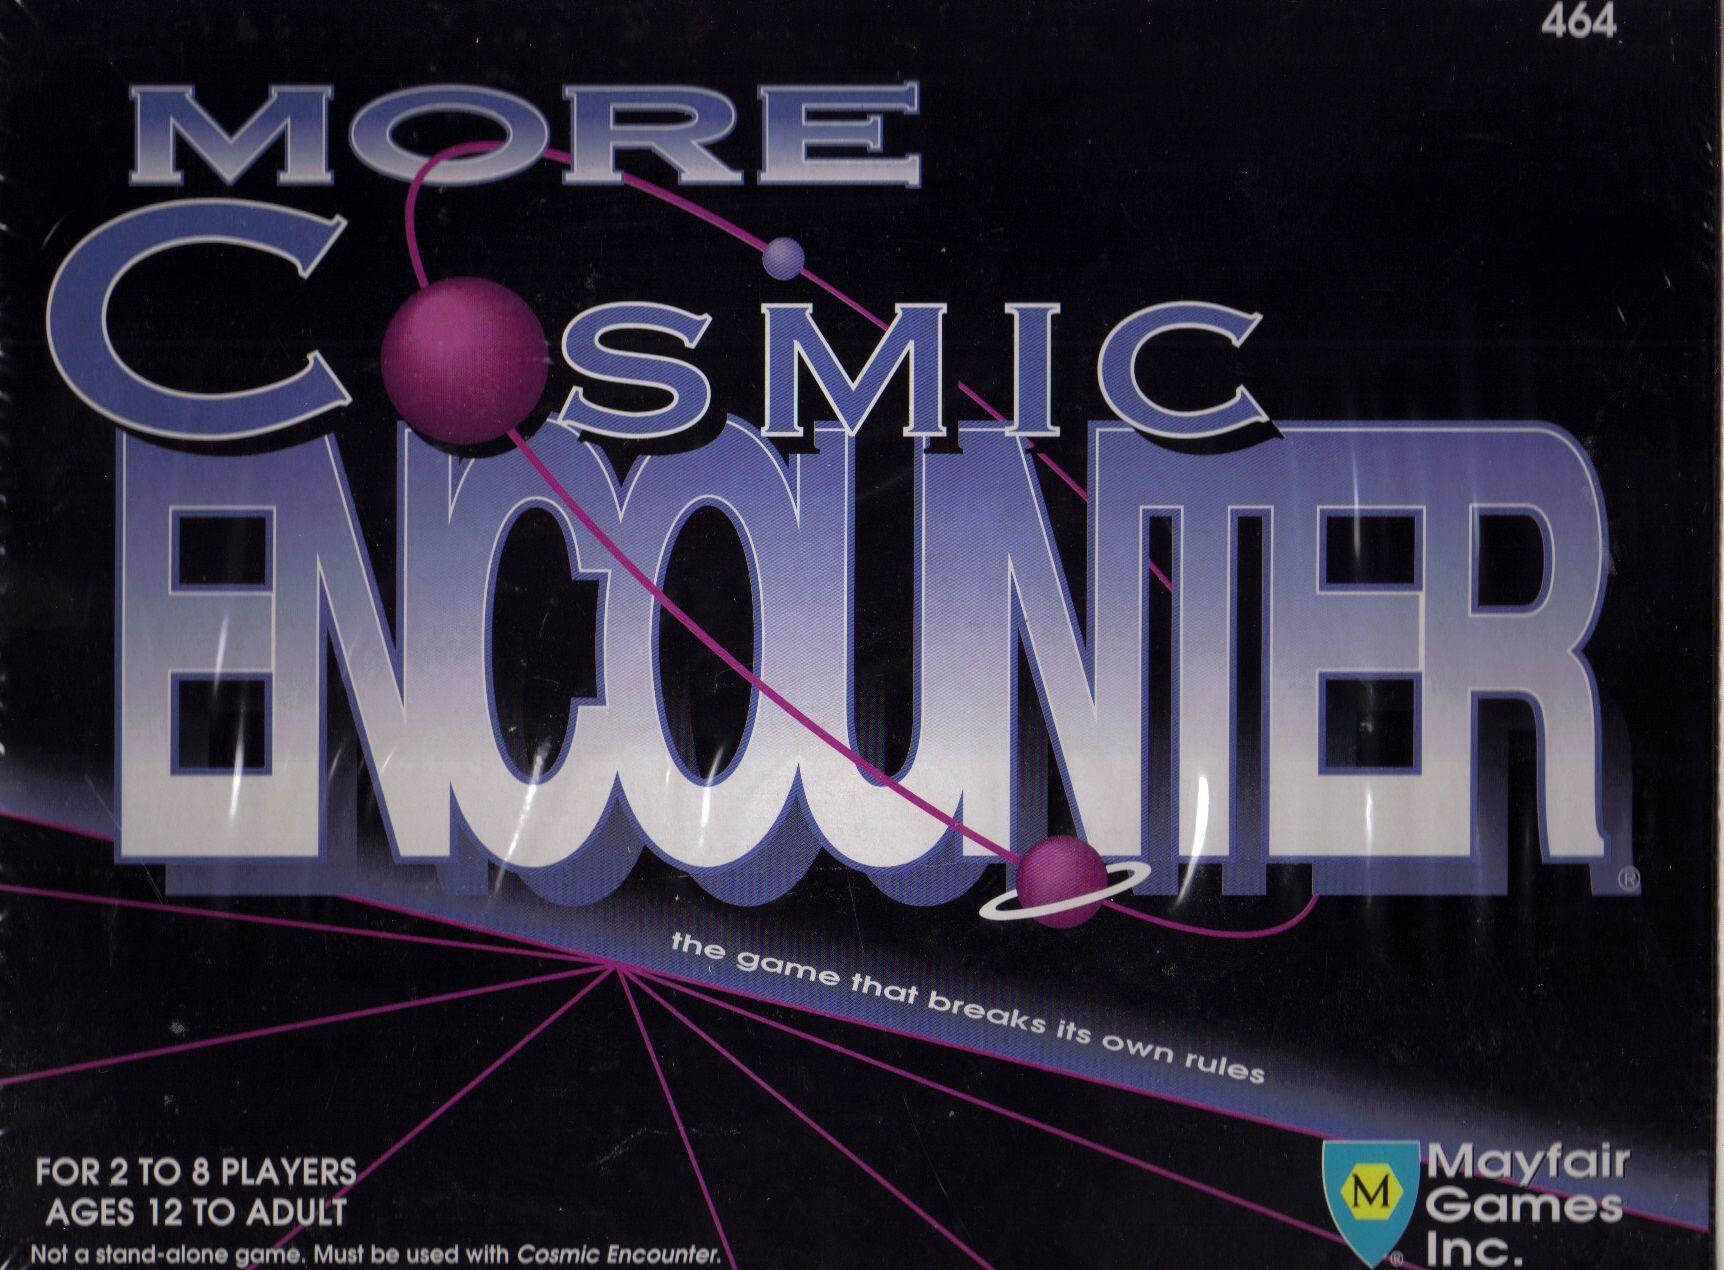 More Cosmic Encounter